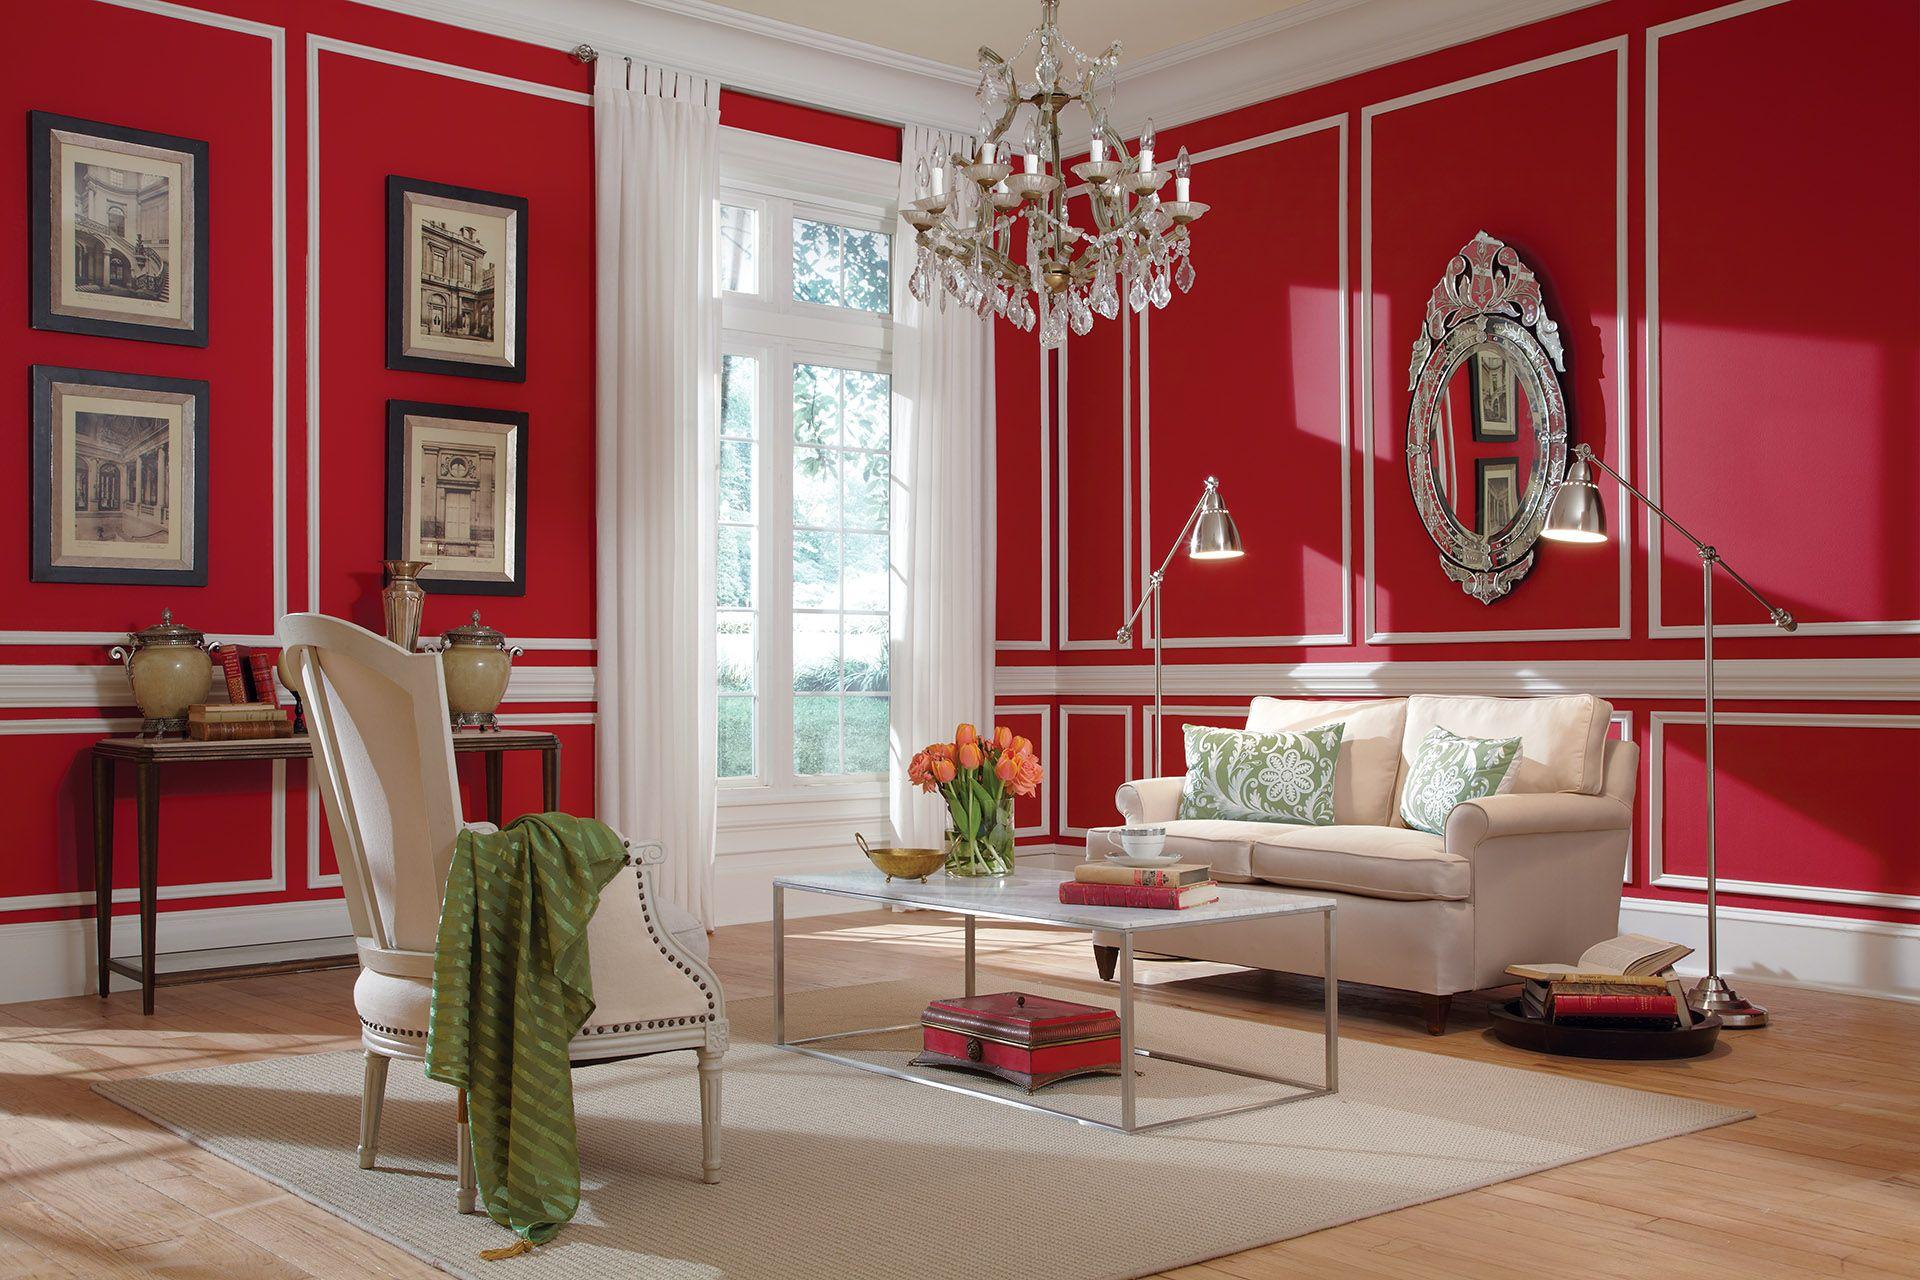 Strange Color On Wall Daring Red 06B 7 Color On Trim Belgian Evergreenethics Interior Chair Design Evergreenethicsorg